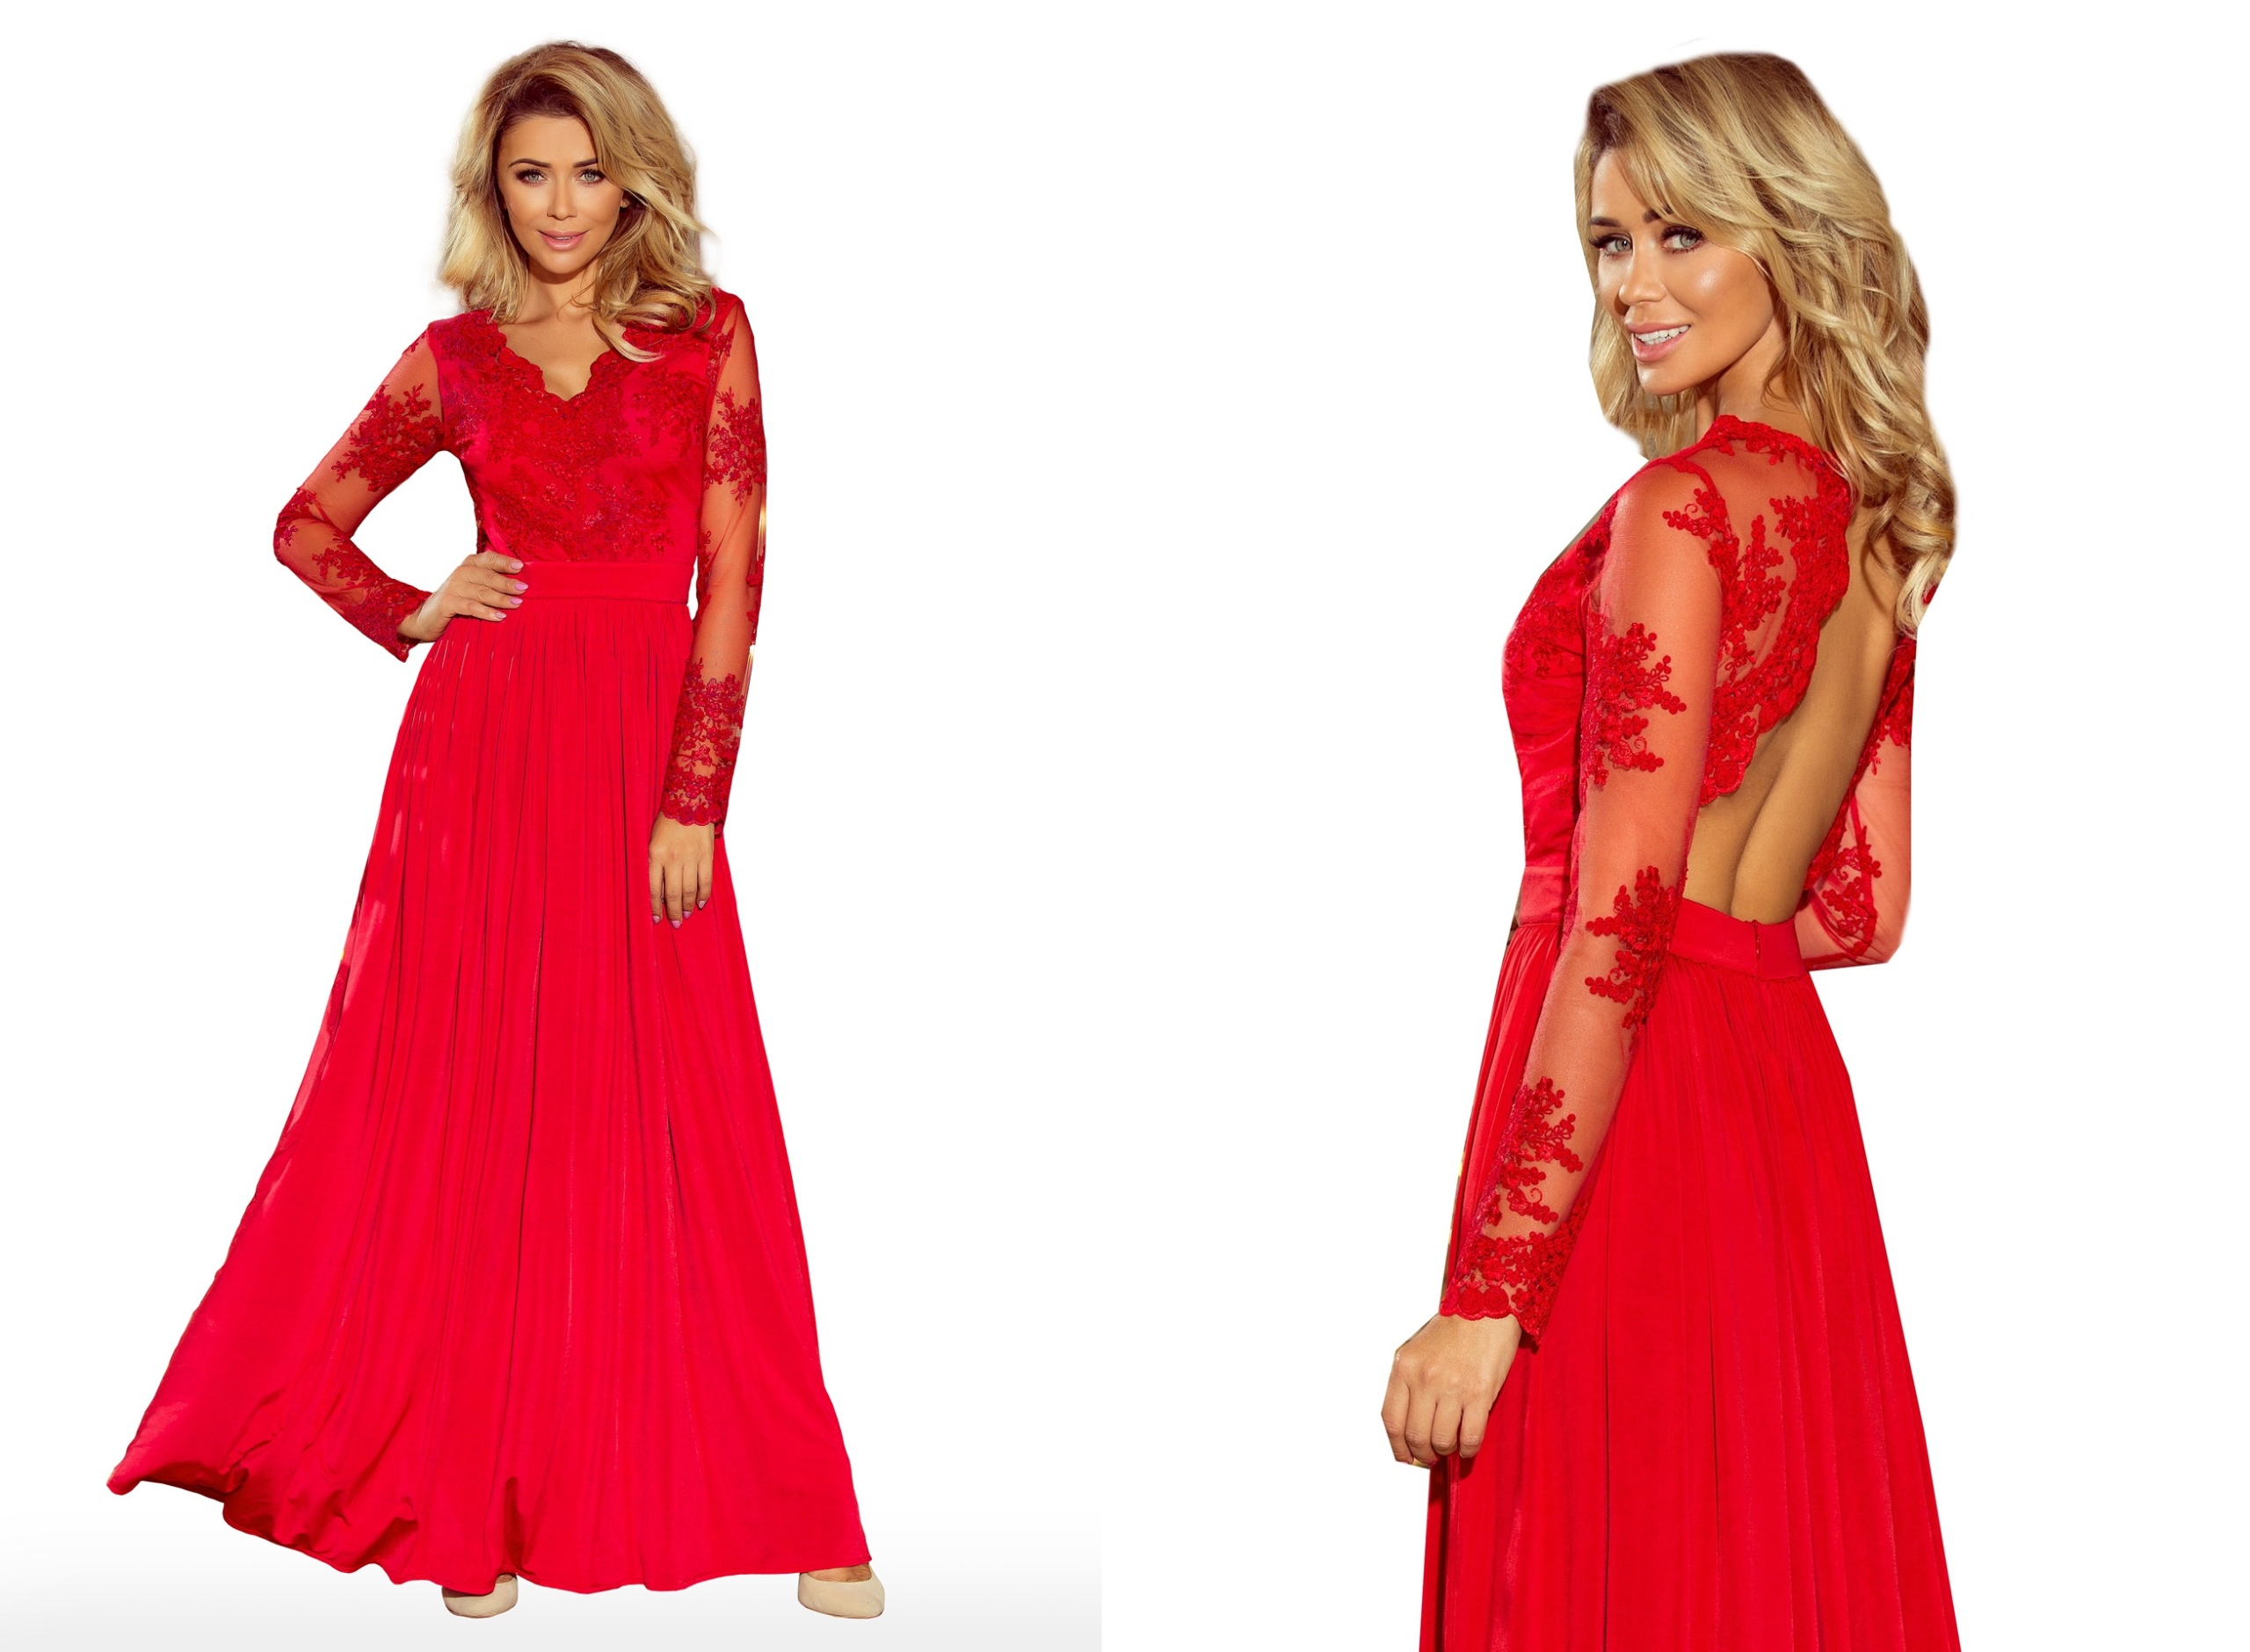 b18d0fab63 ROZKLOSZOWANA MAXI Sukienka SUKNIA BALOWA 213-3 S 7605396910 - Allegro.pl